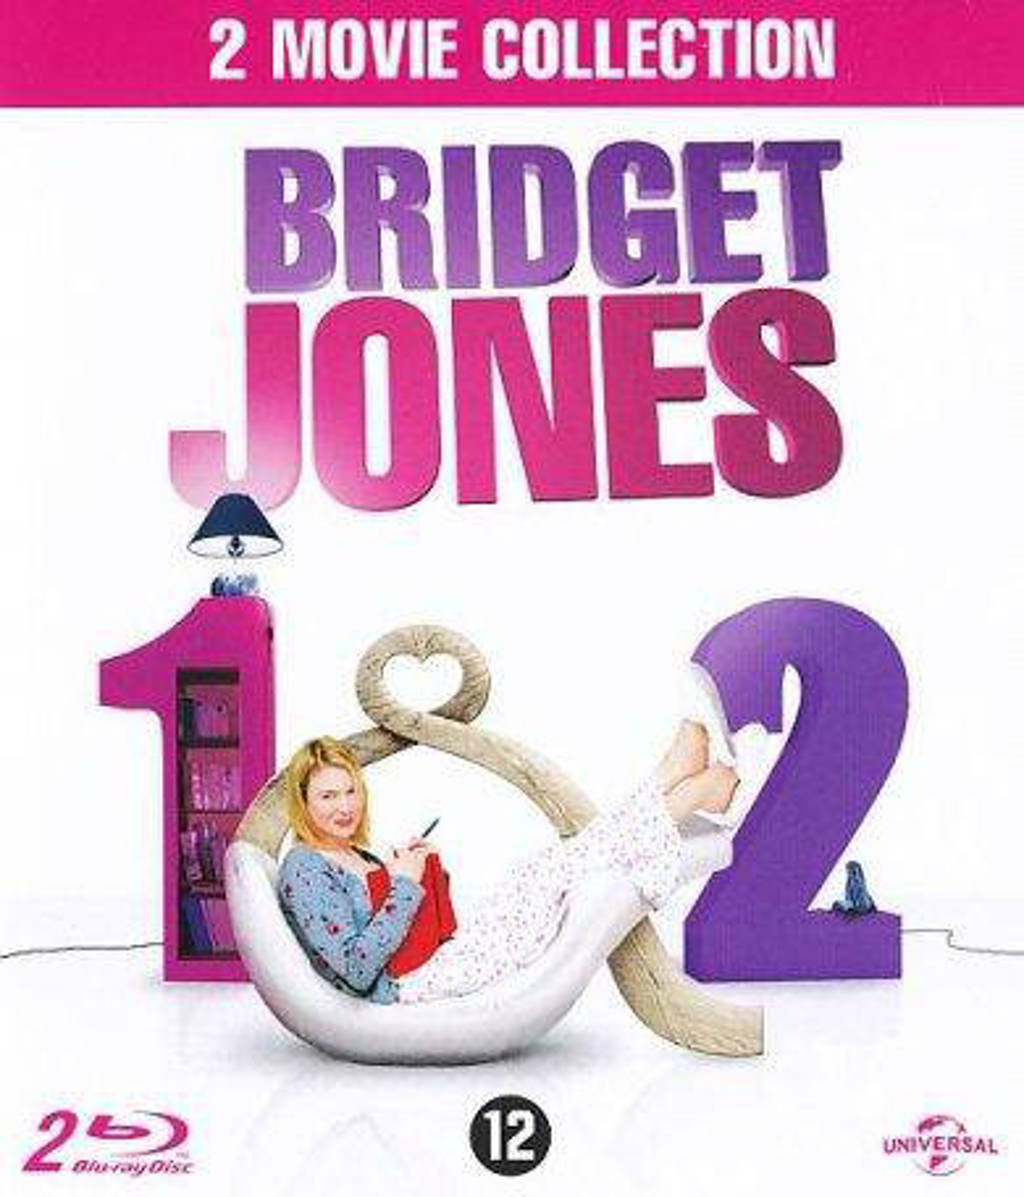 Bridget Jones 1 & 2 (Blu-ray)